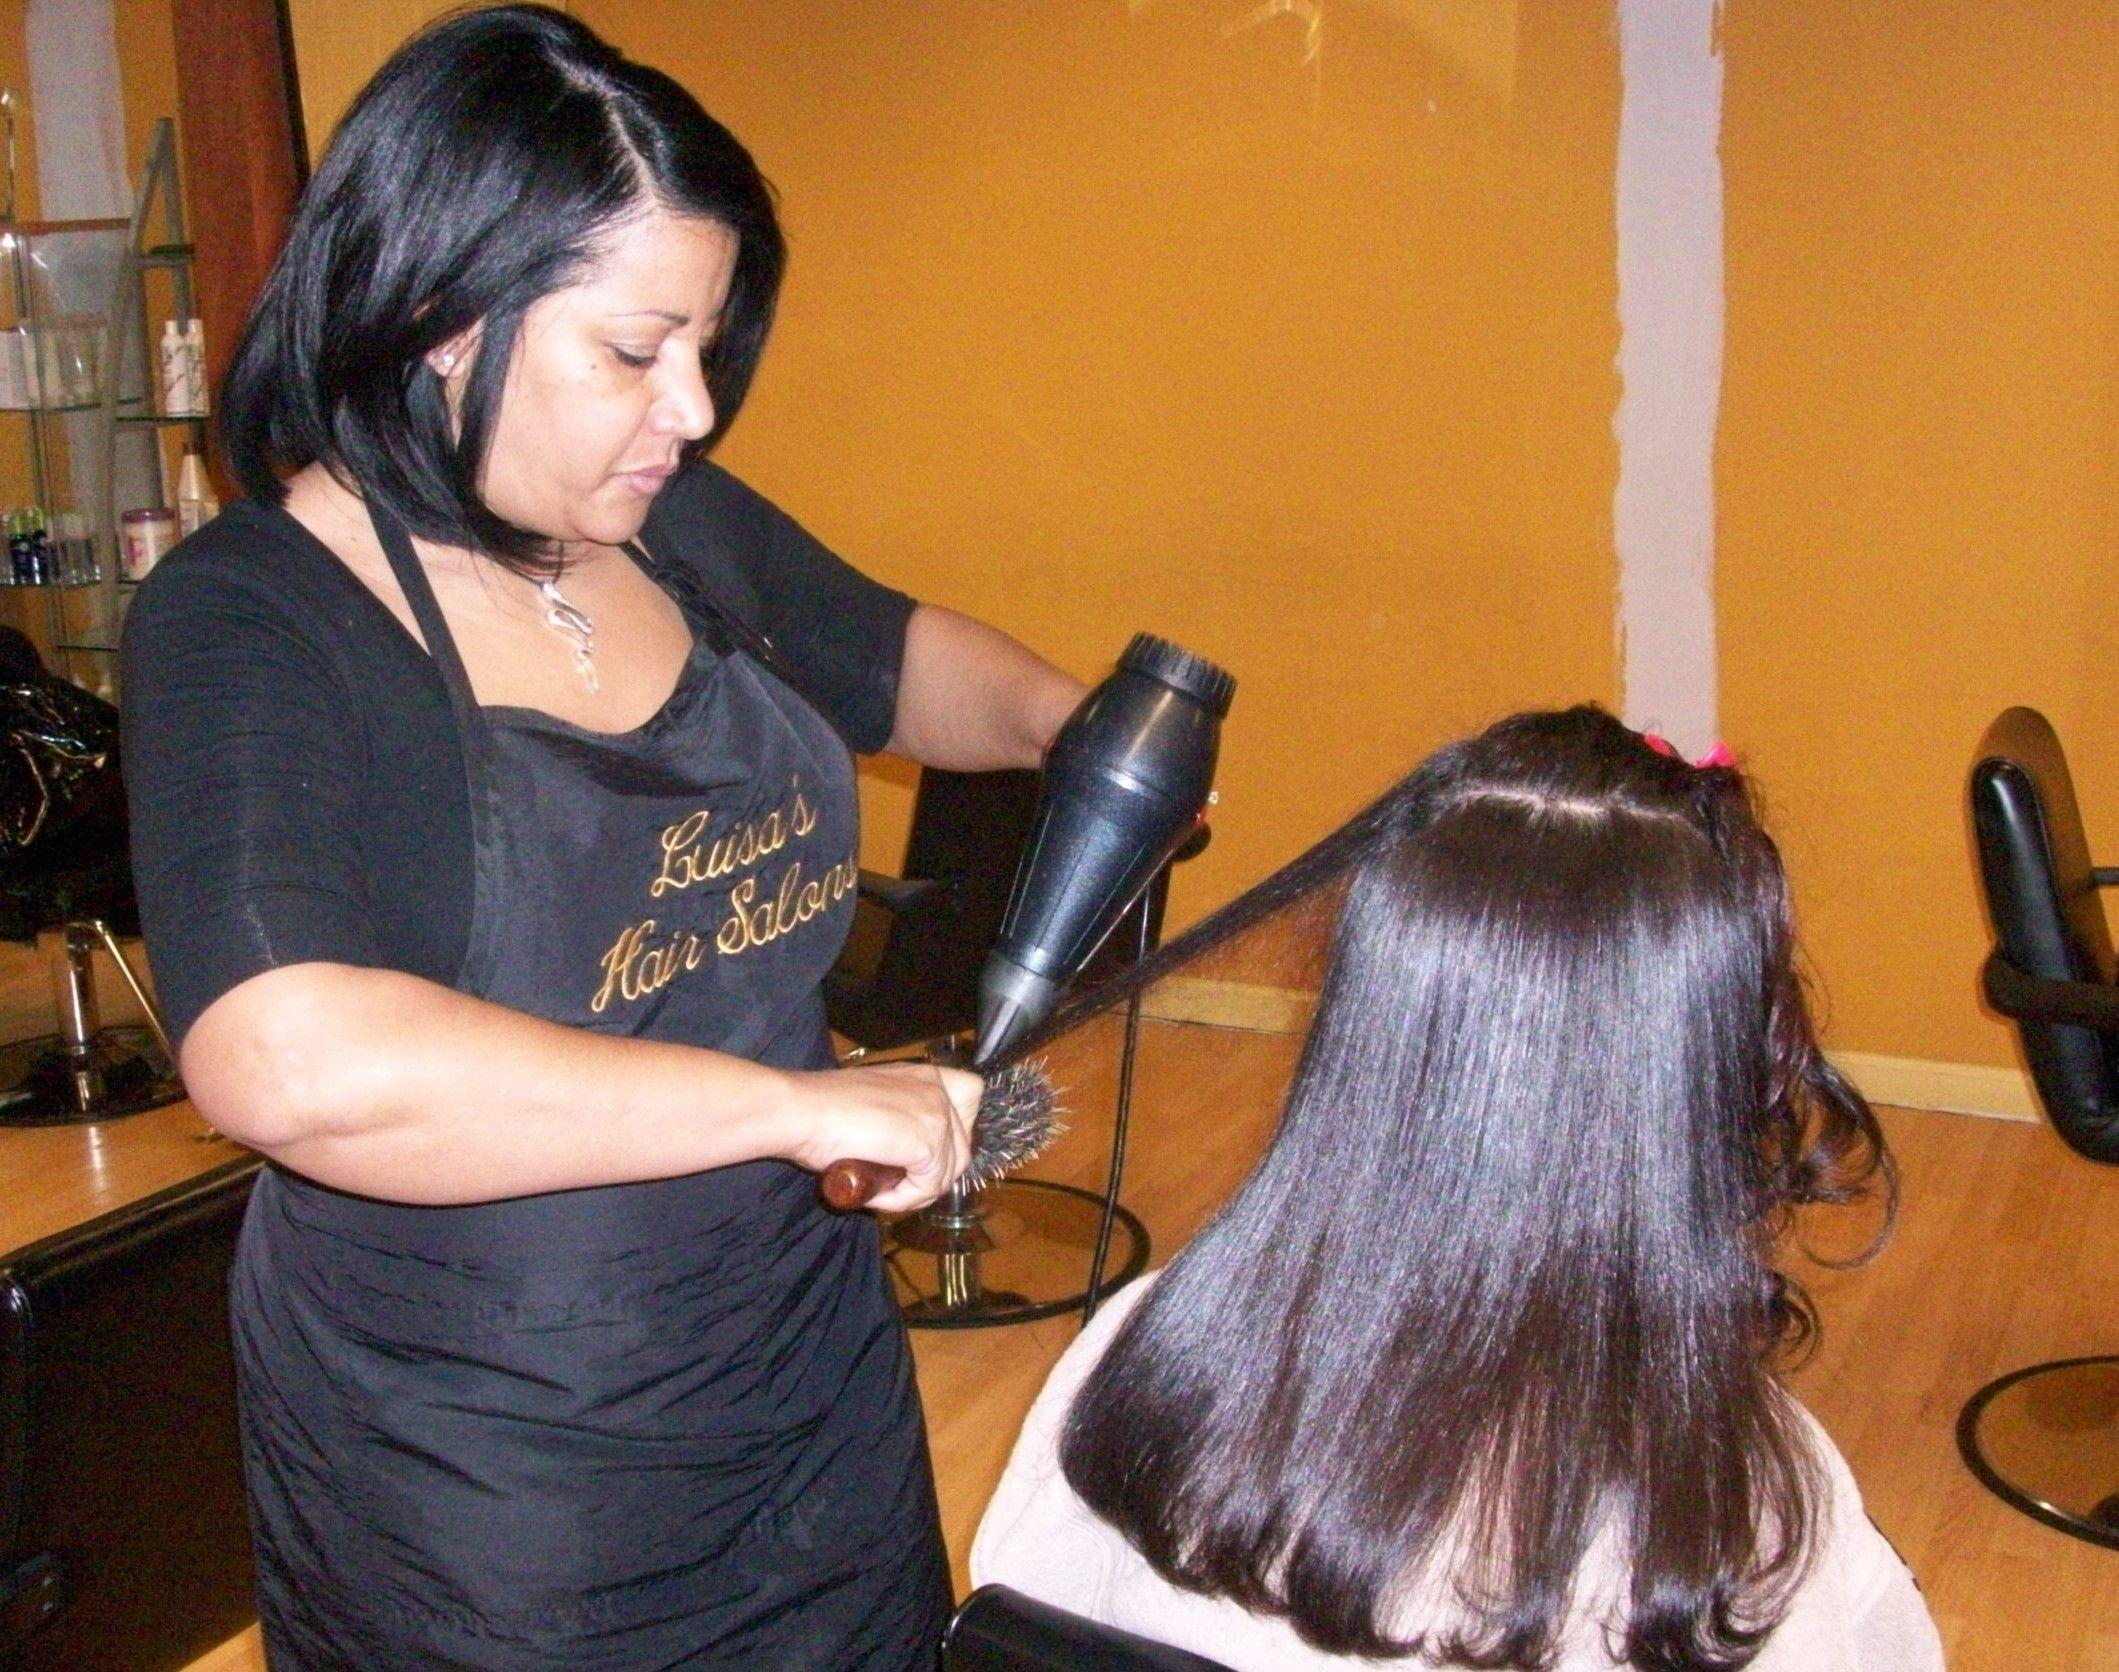 Dominican Hair Salon Find Dominican Hair Salons Dominicansalons Natural Hair Stylists Natural Hair Styles Natural Hair Salons